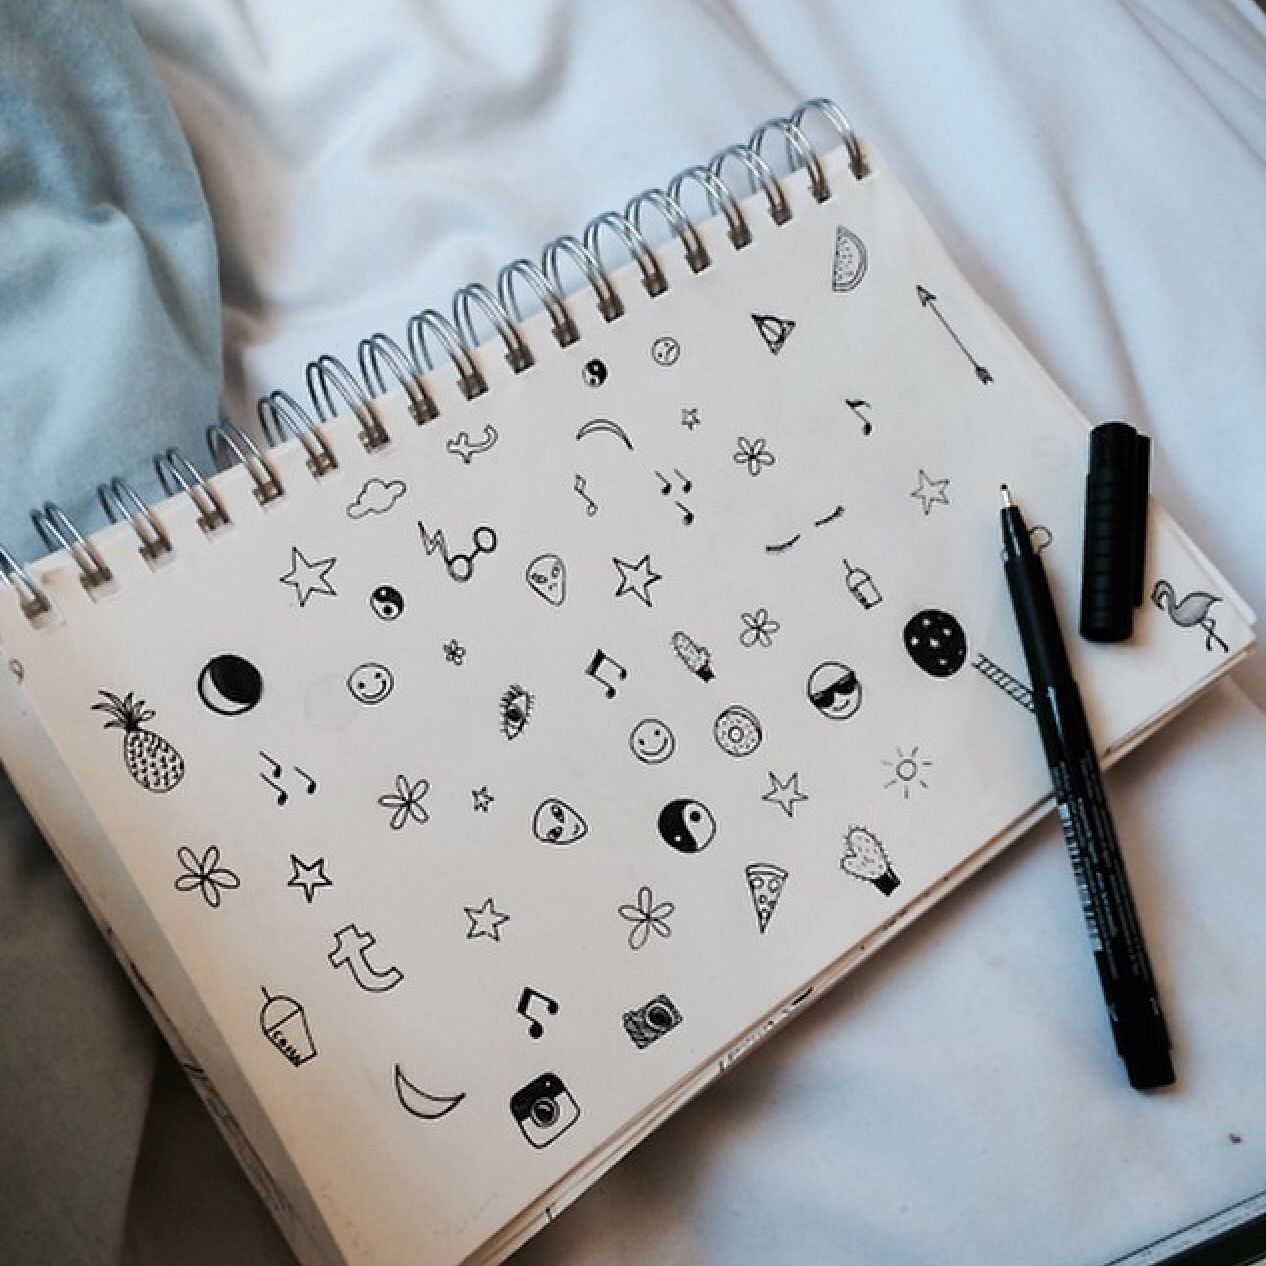 Tumblr  symbols  notebook     Tumblr photography, Doodles, Sketch book